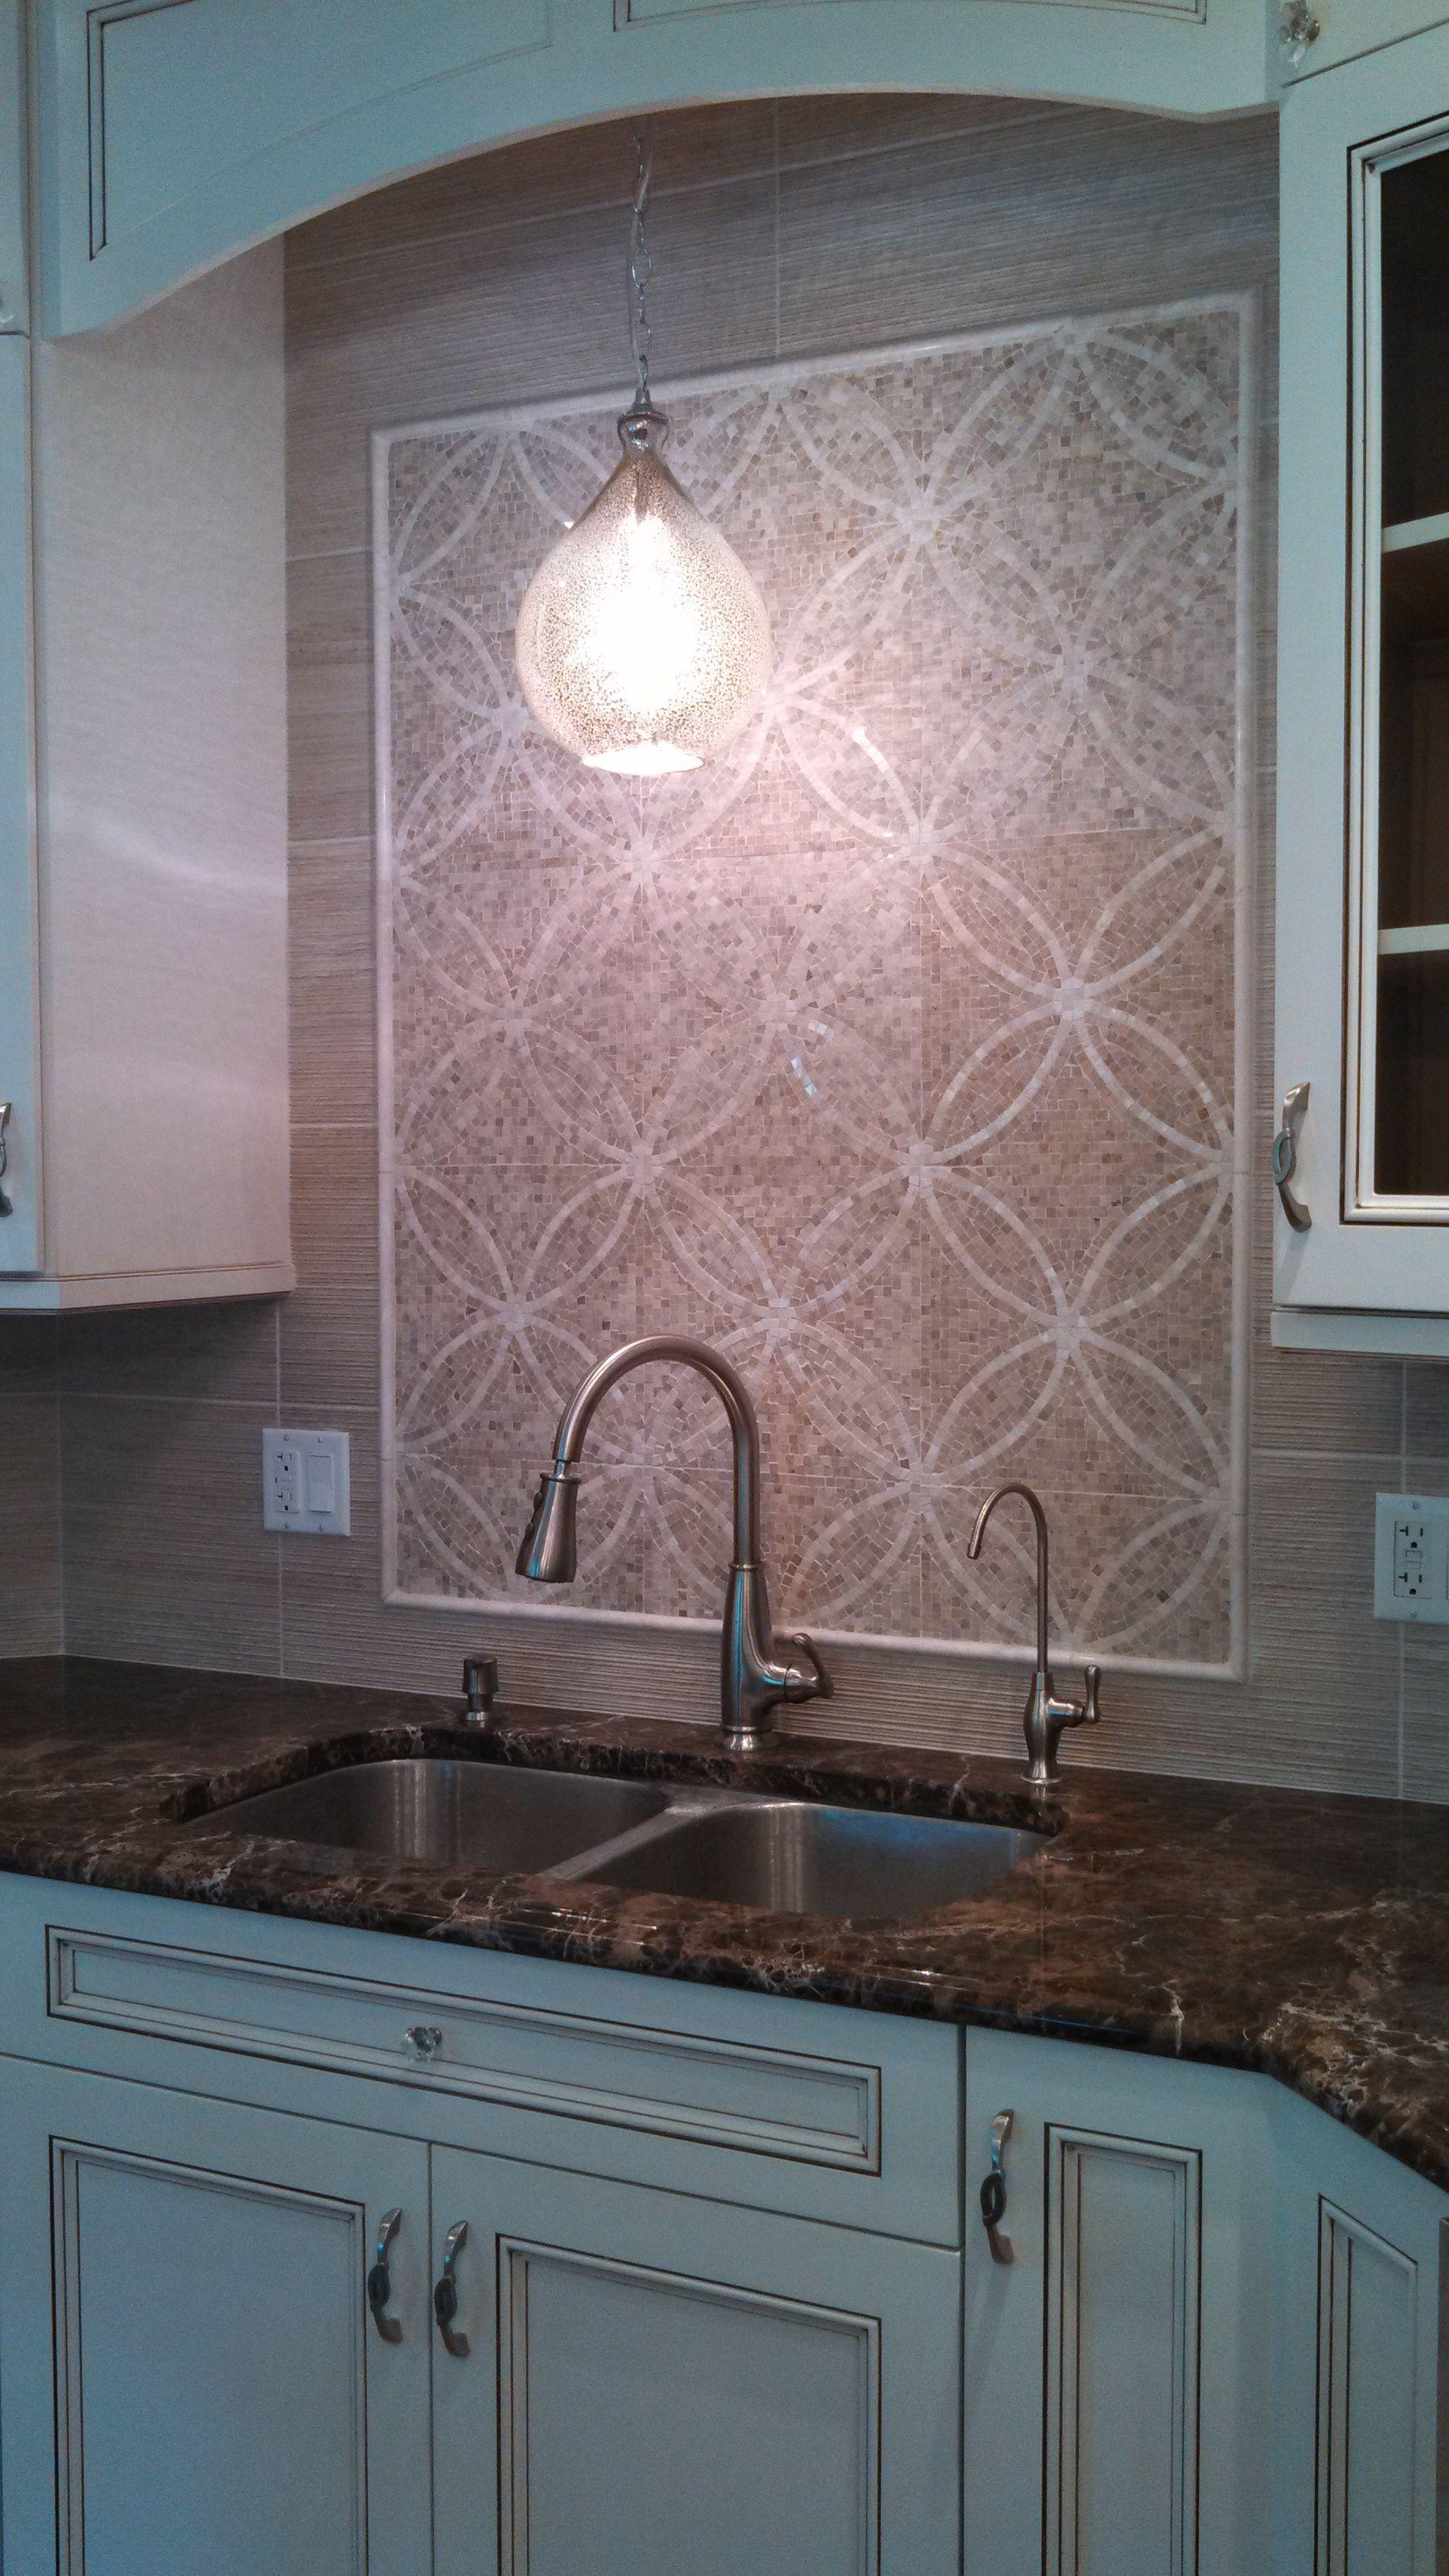 Mid america tile elk grove village - Kitchen Designer Donna Triolo Mid America Tile Elk Grove Village Il